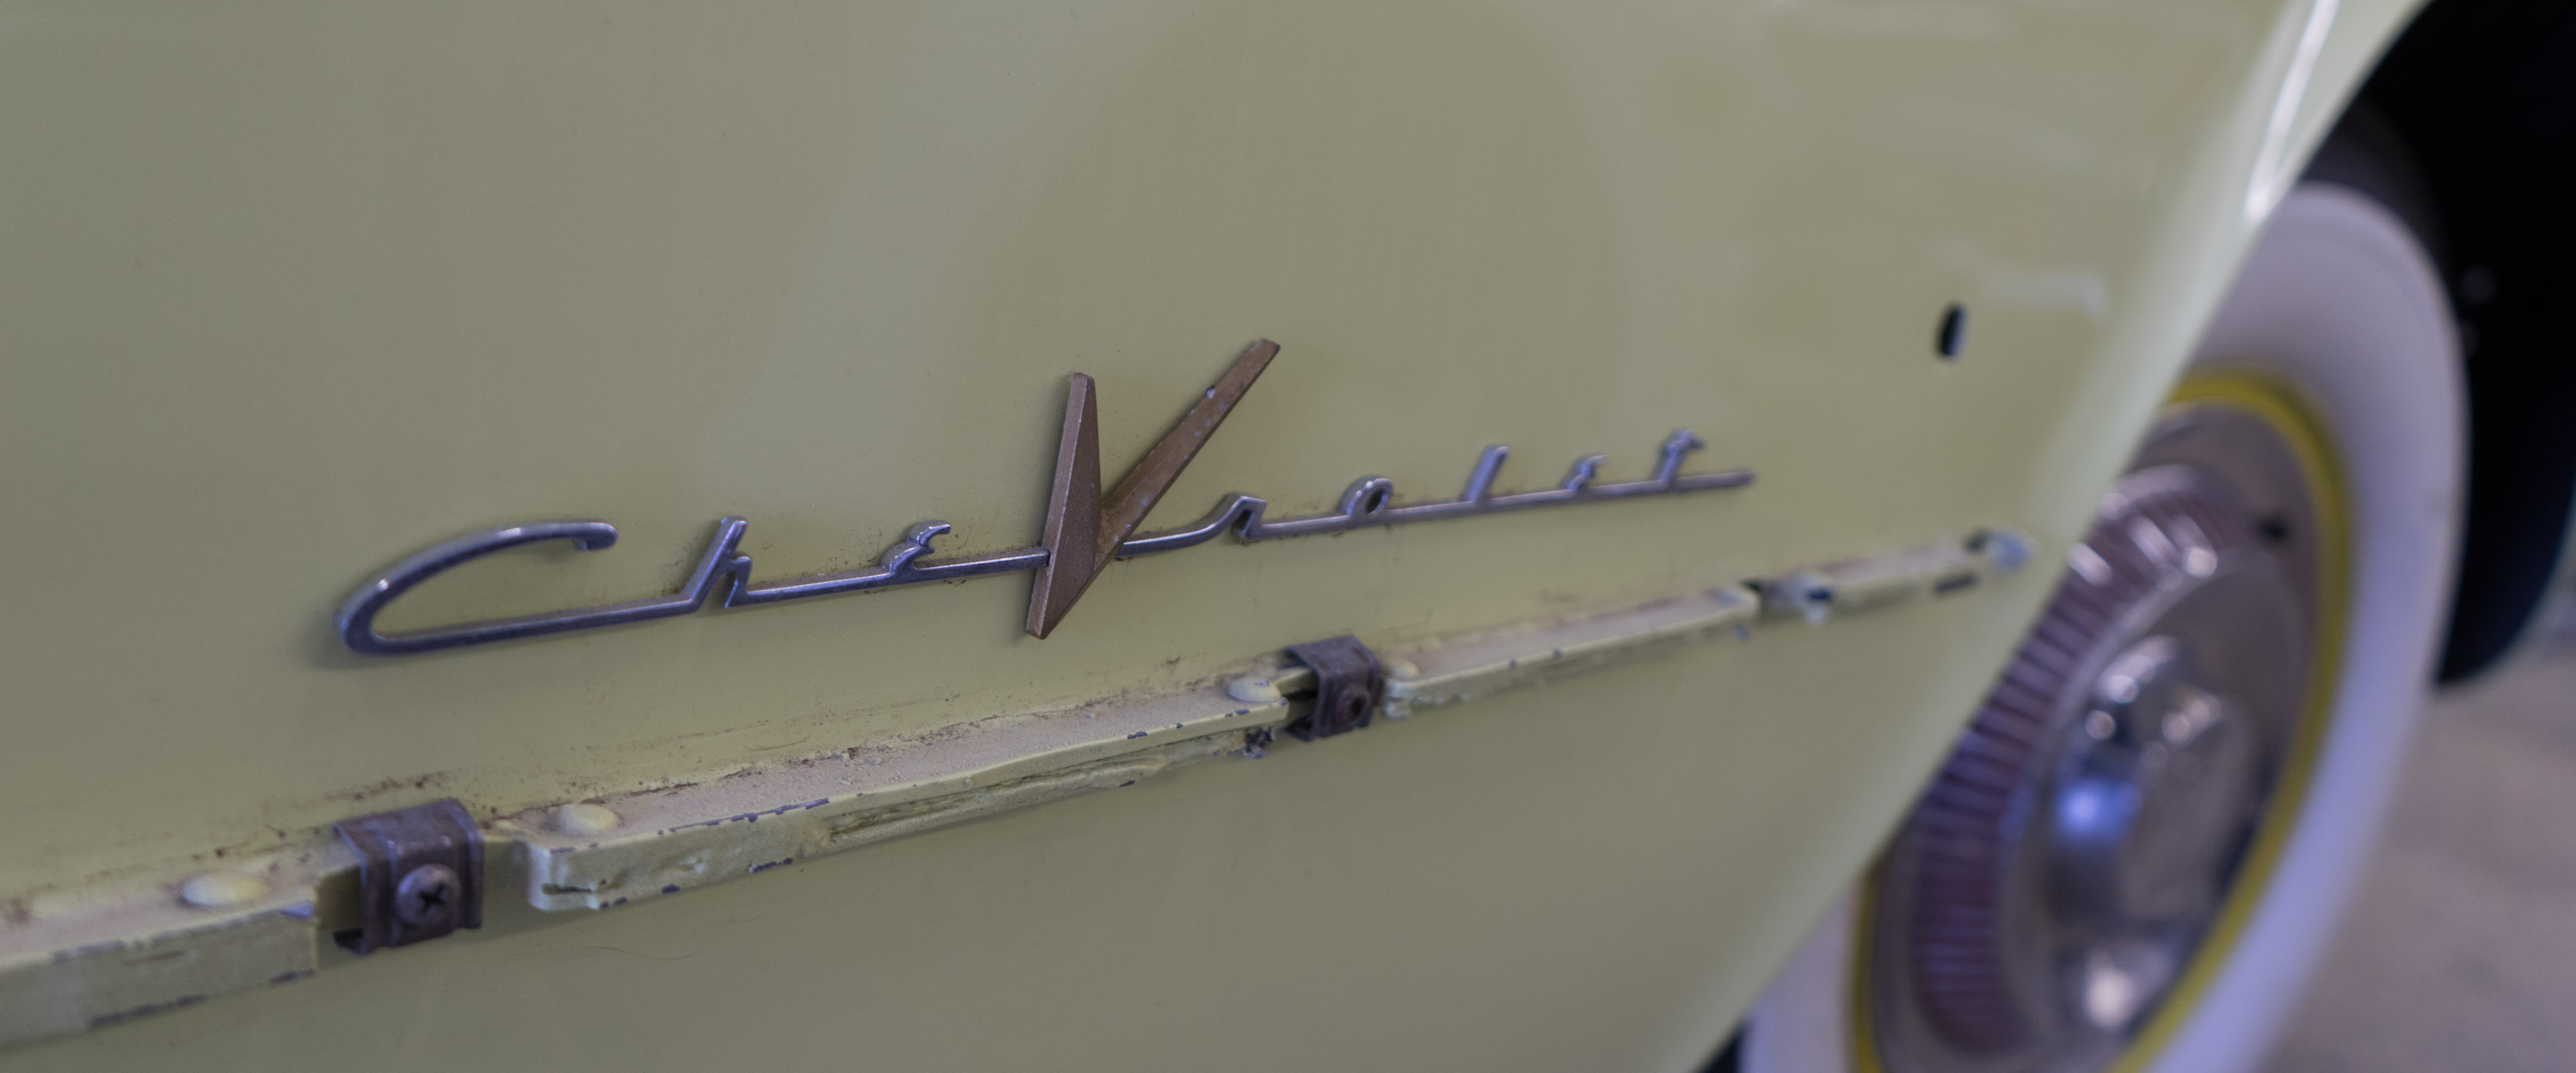 1955-Chevrolet-Corvette-Roadster-Yellow-slideshow-006@2x